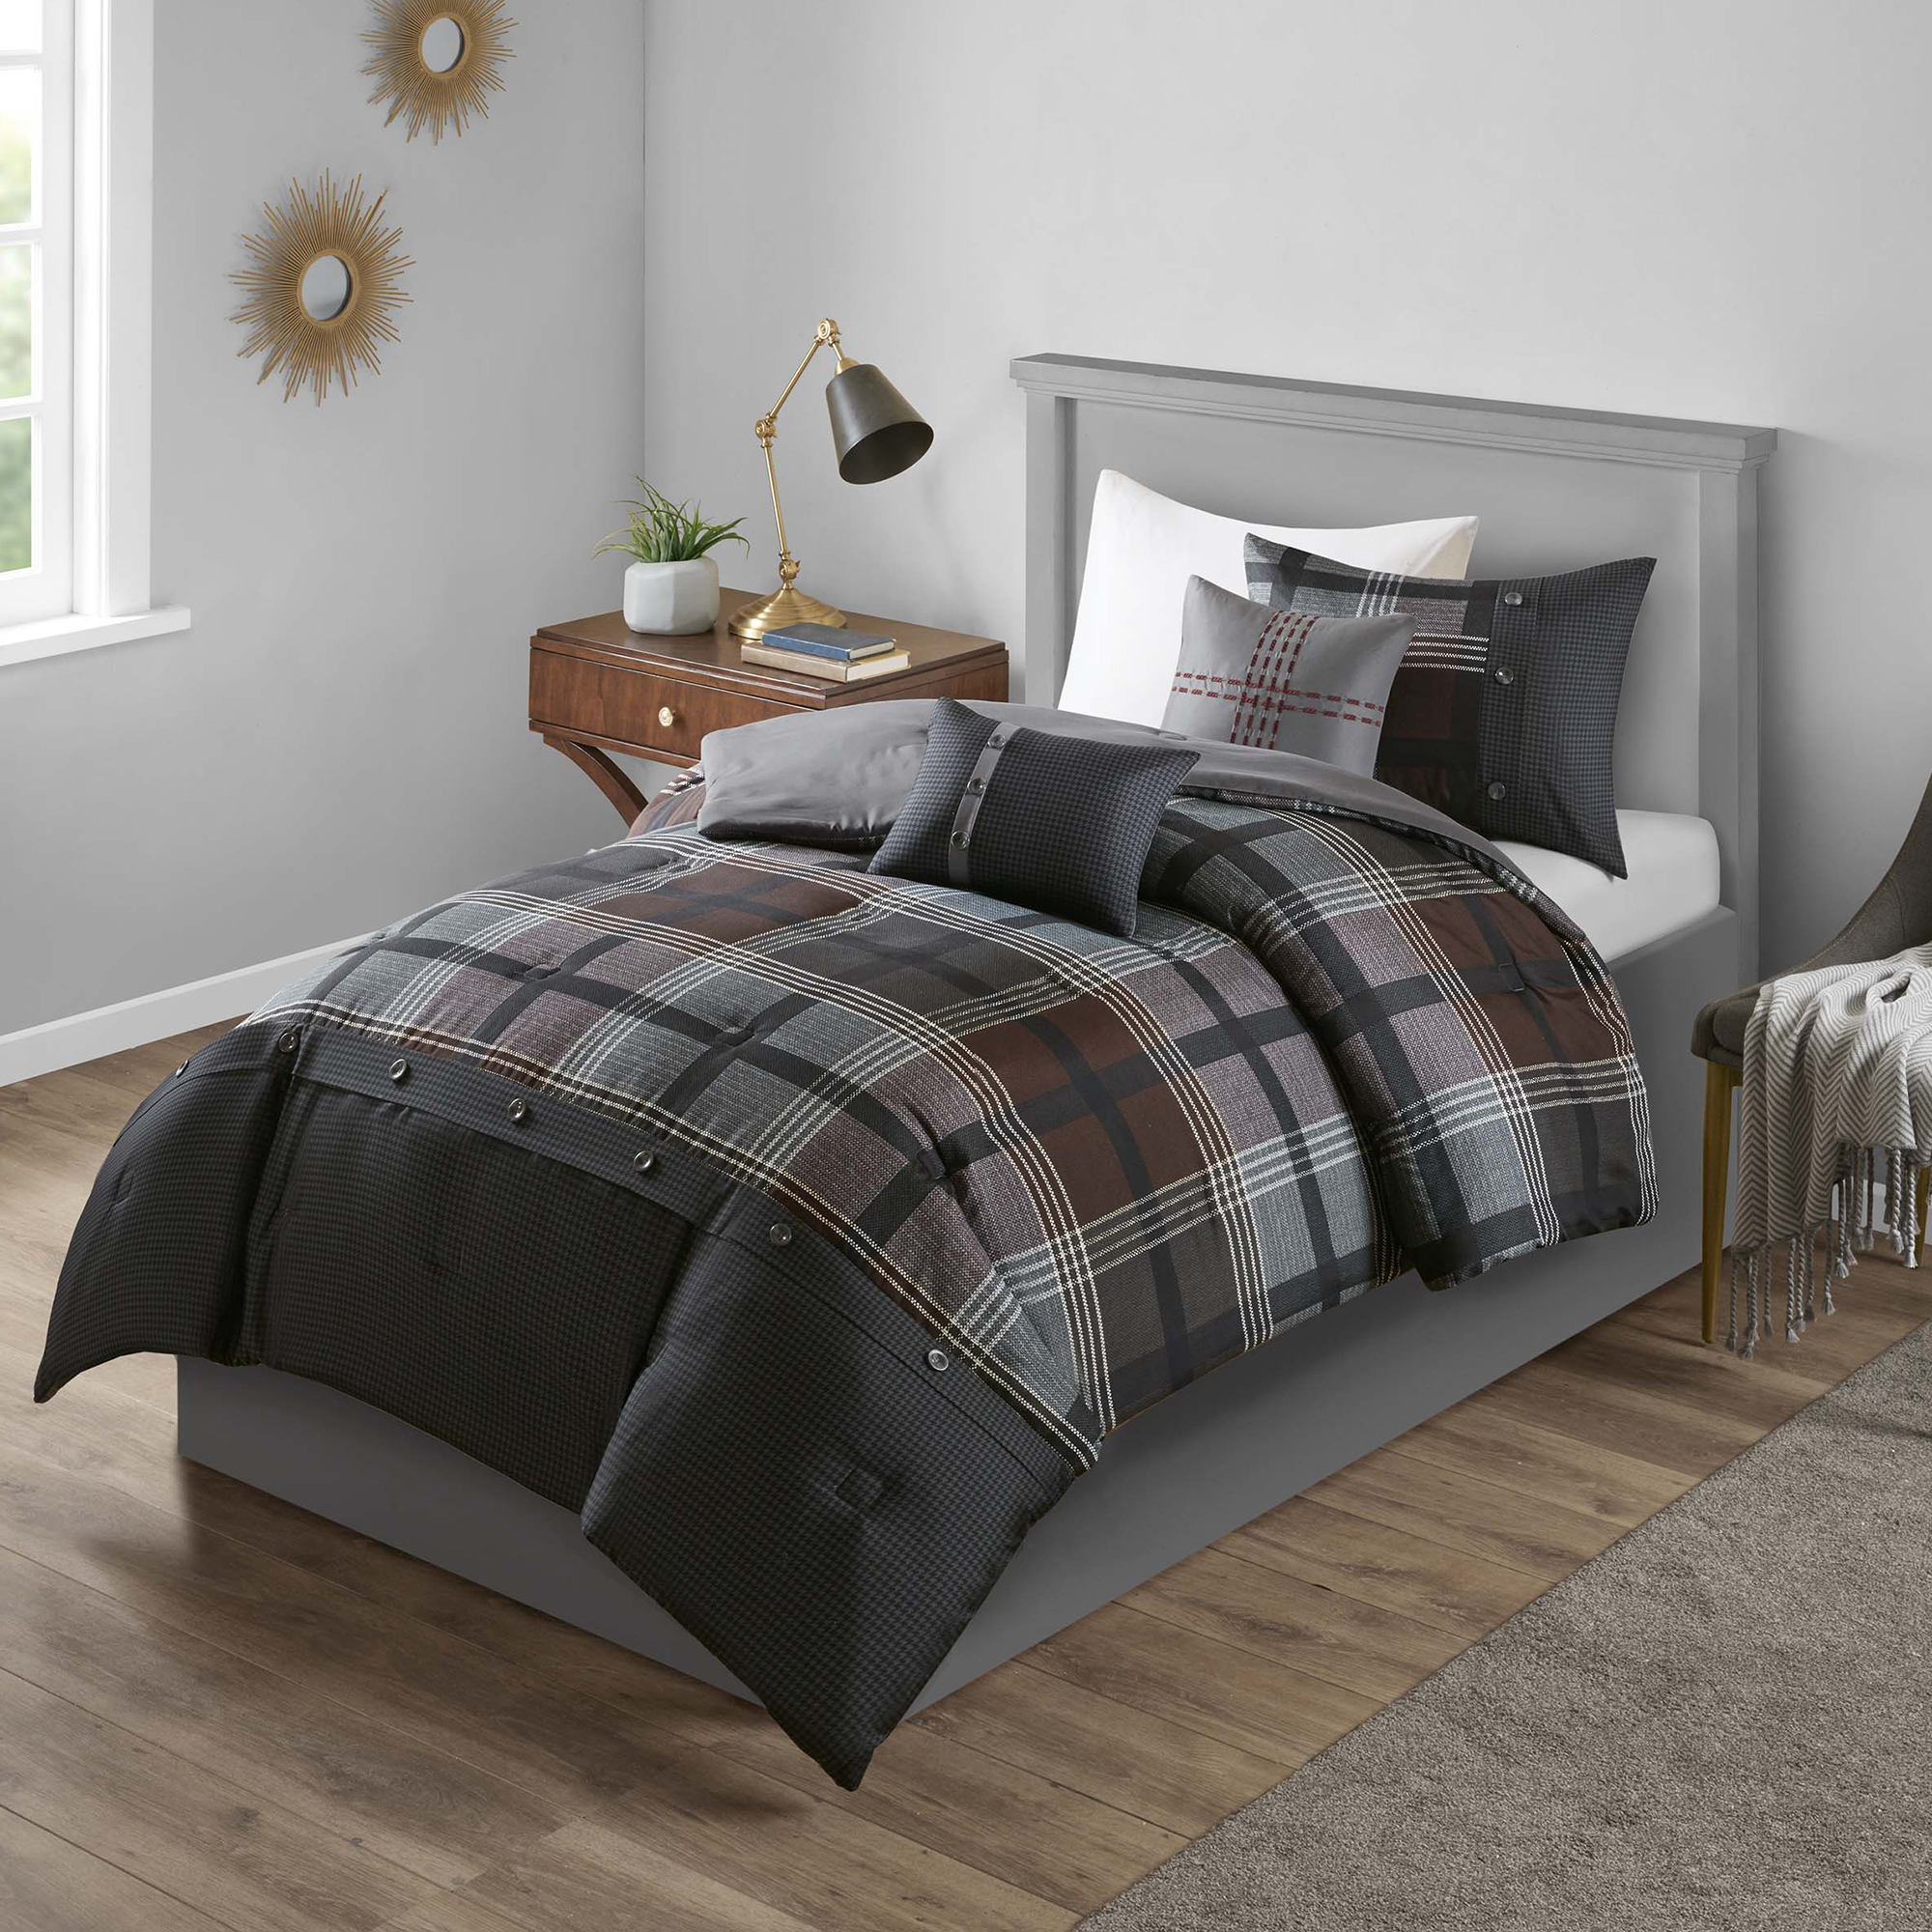 Mainstays Estrella Plaid Printed Comforter Bedding Set